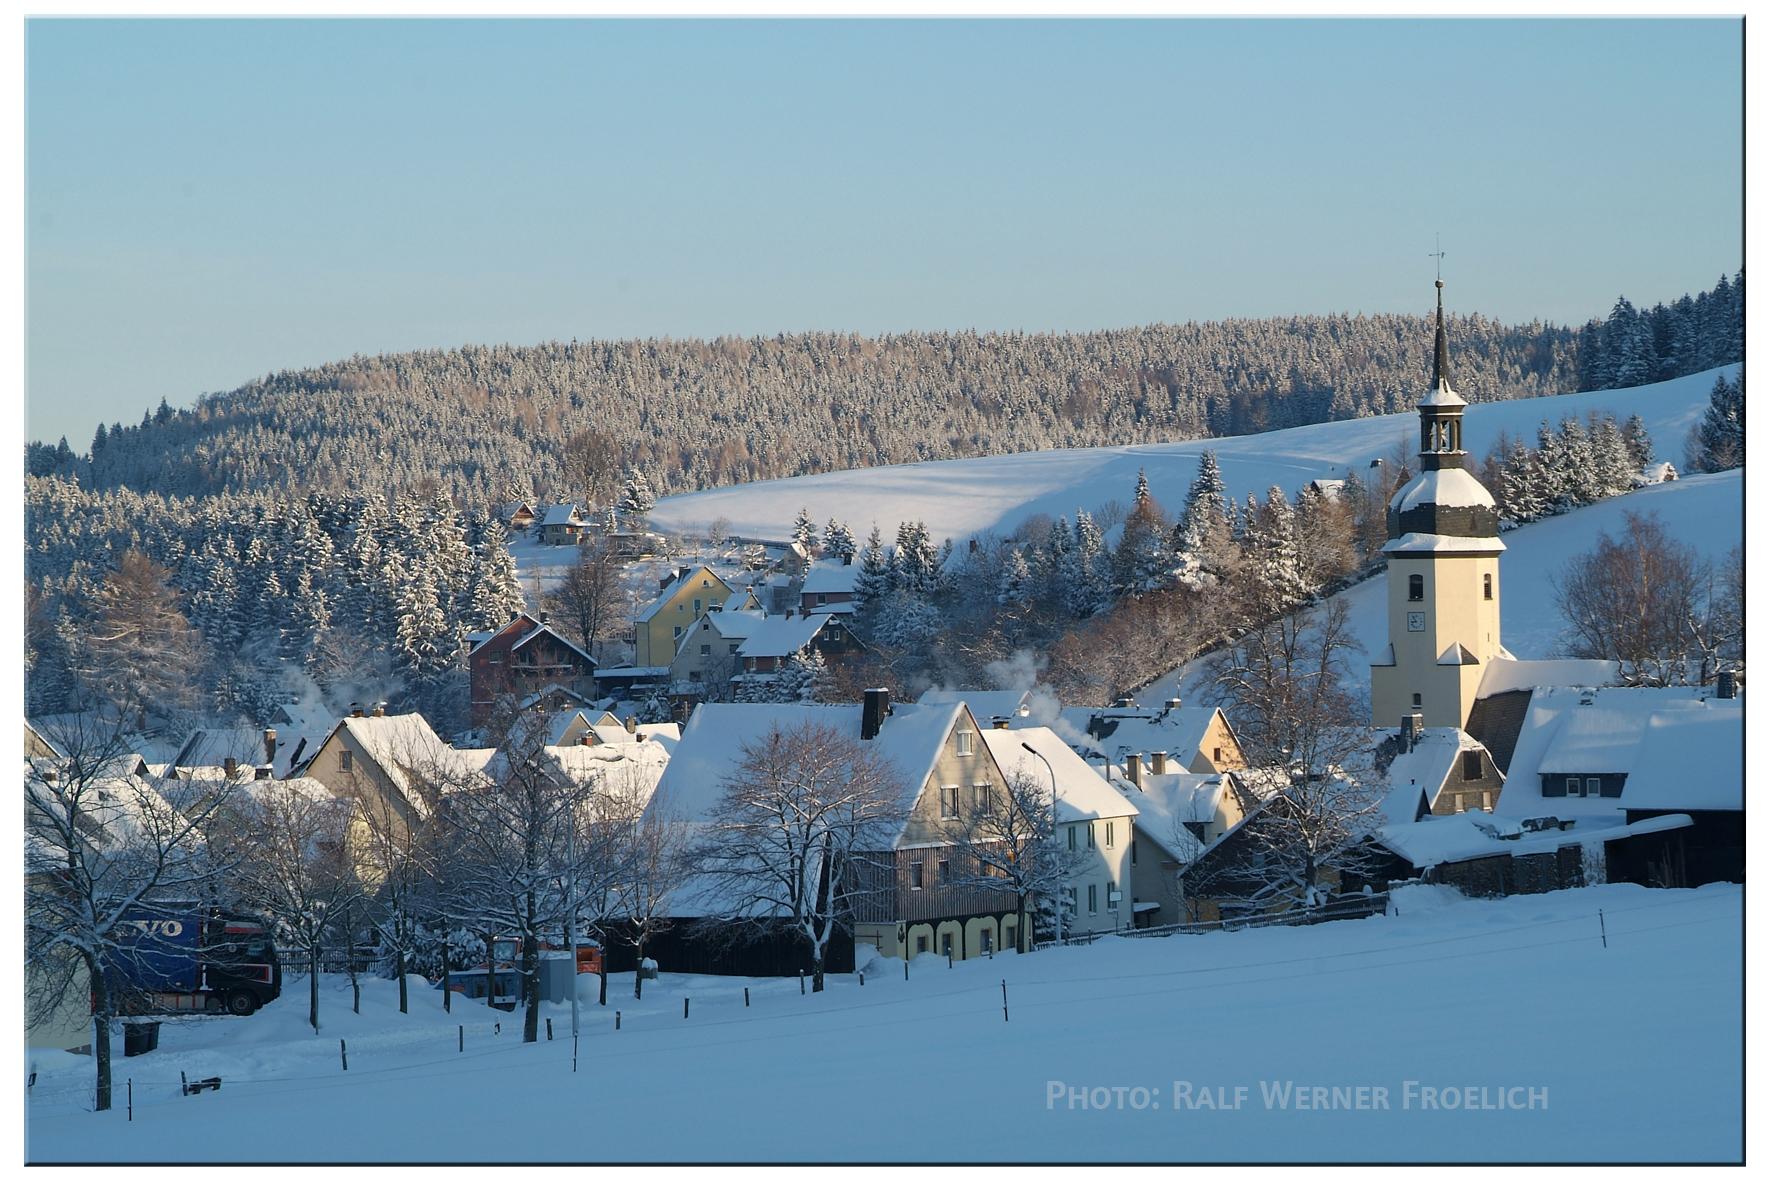 Winter in Sosa im Erzgebirge